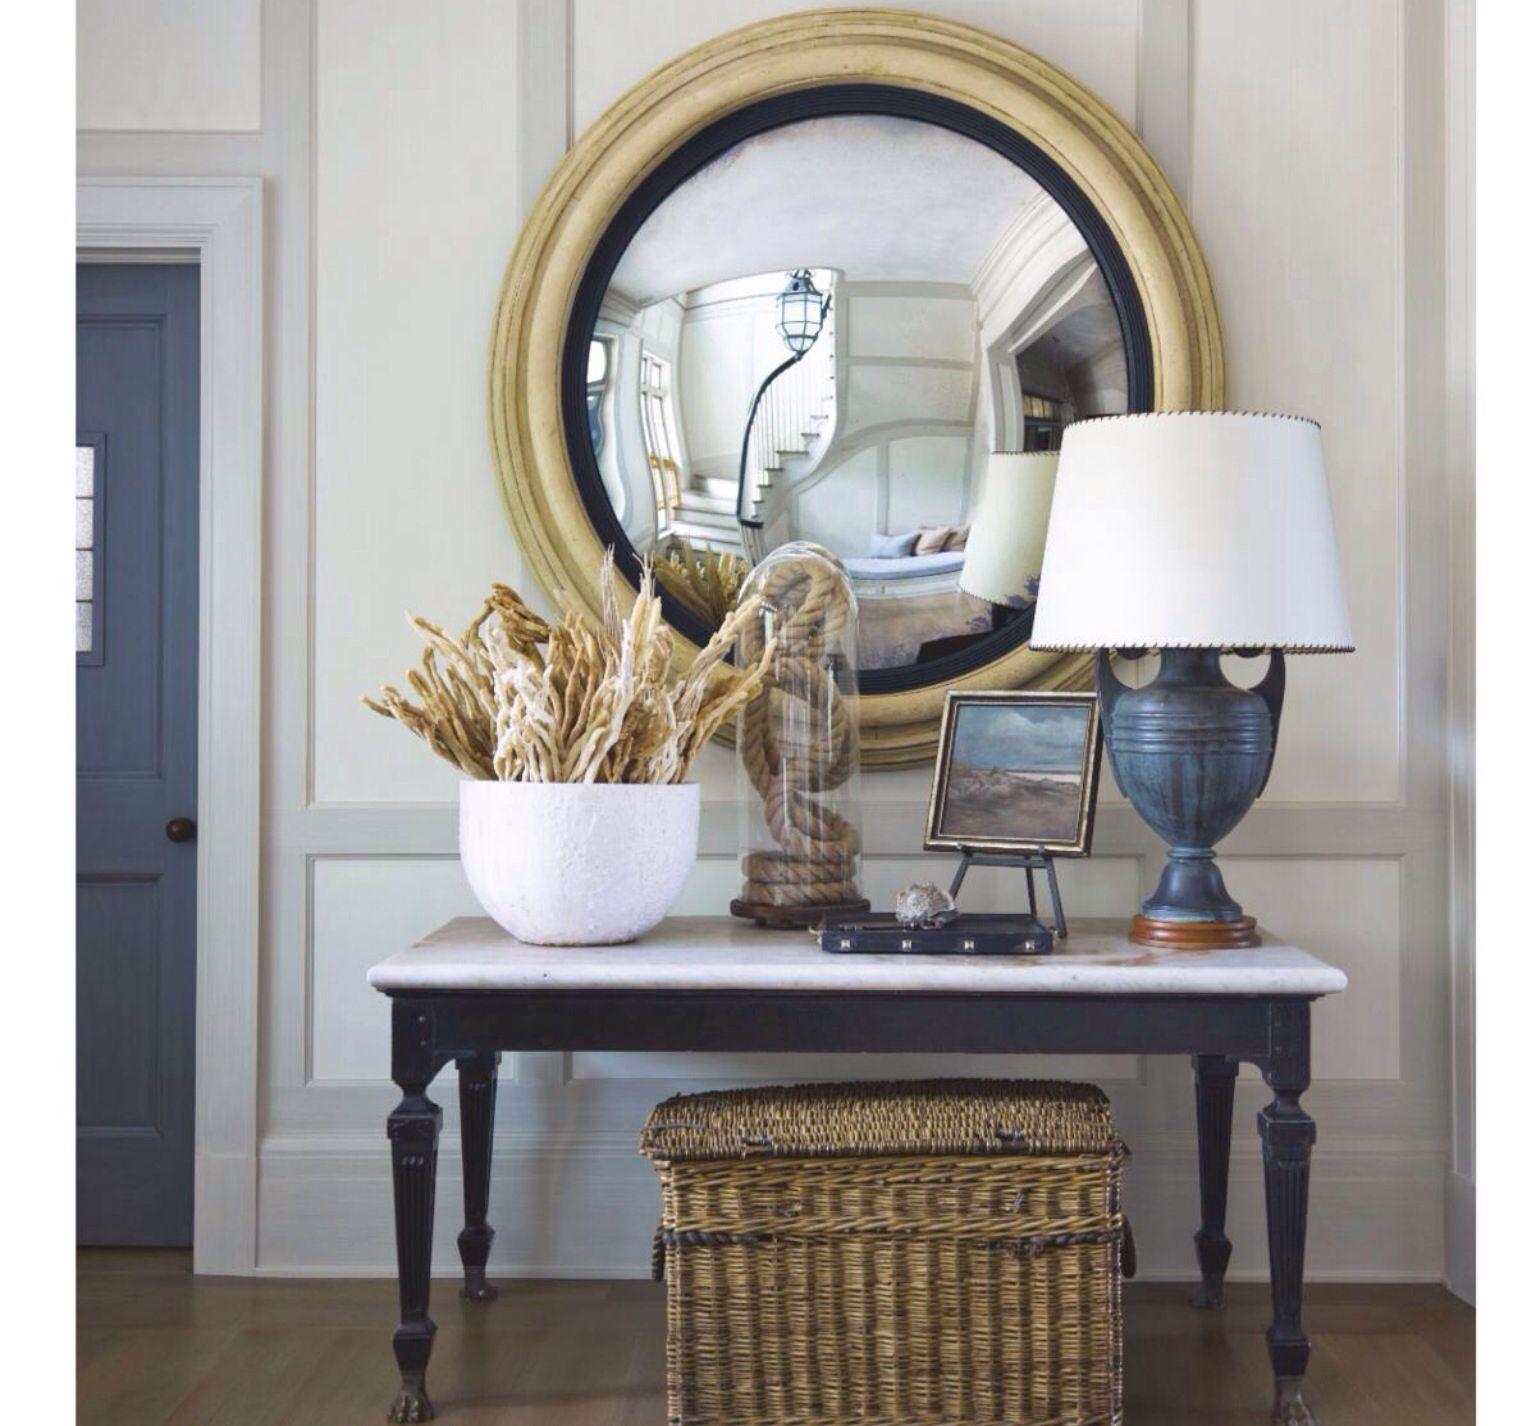 Decorative Foyer Mirror : Decorative mirror for a coastal entryway vignettes